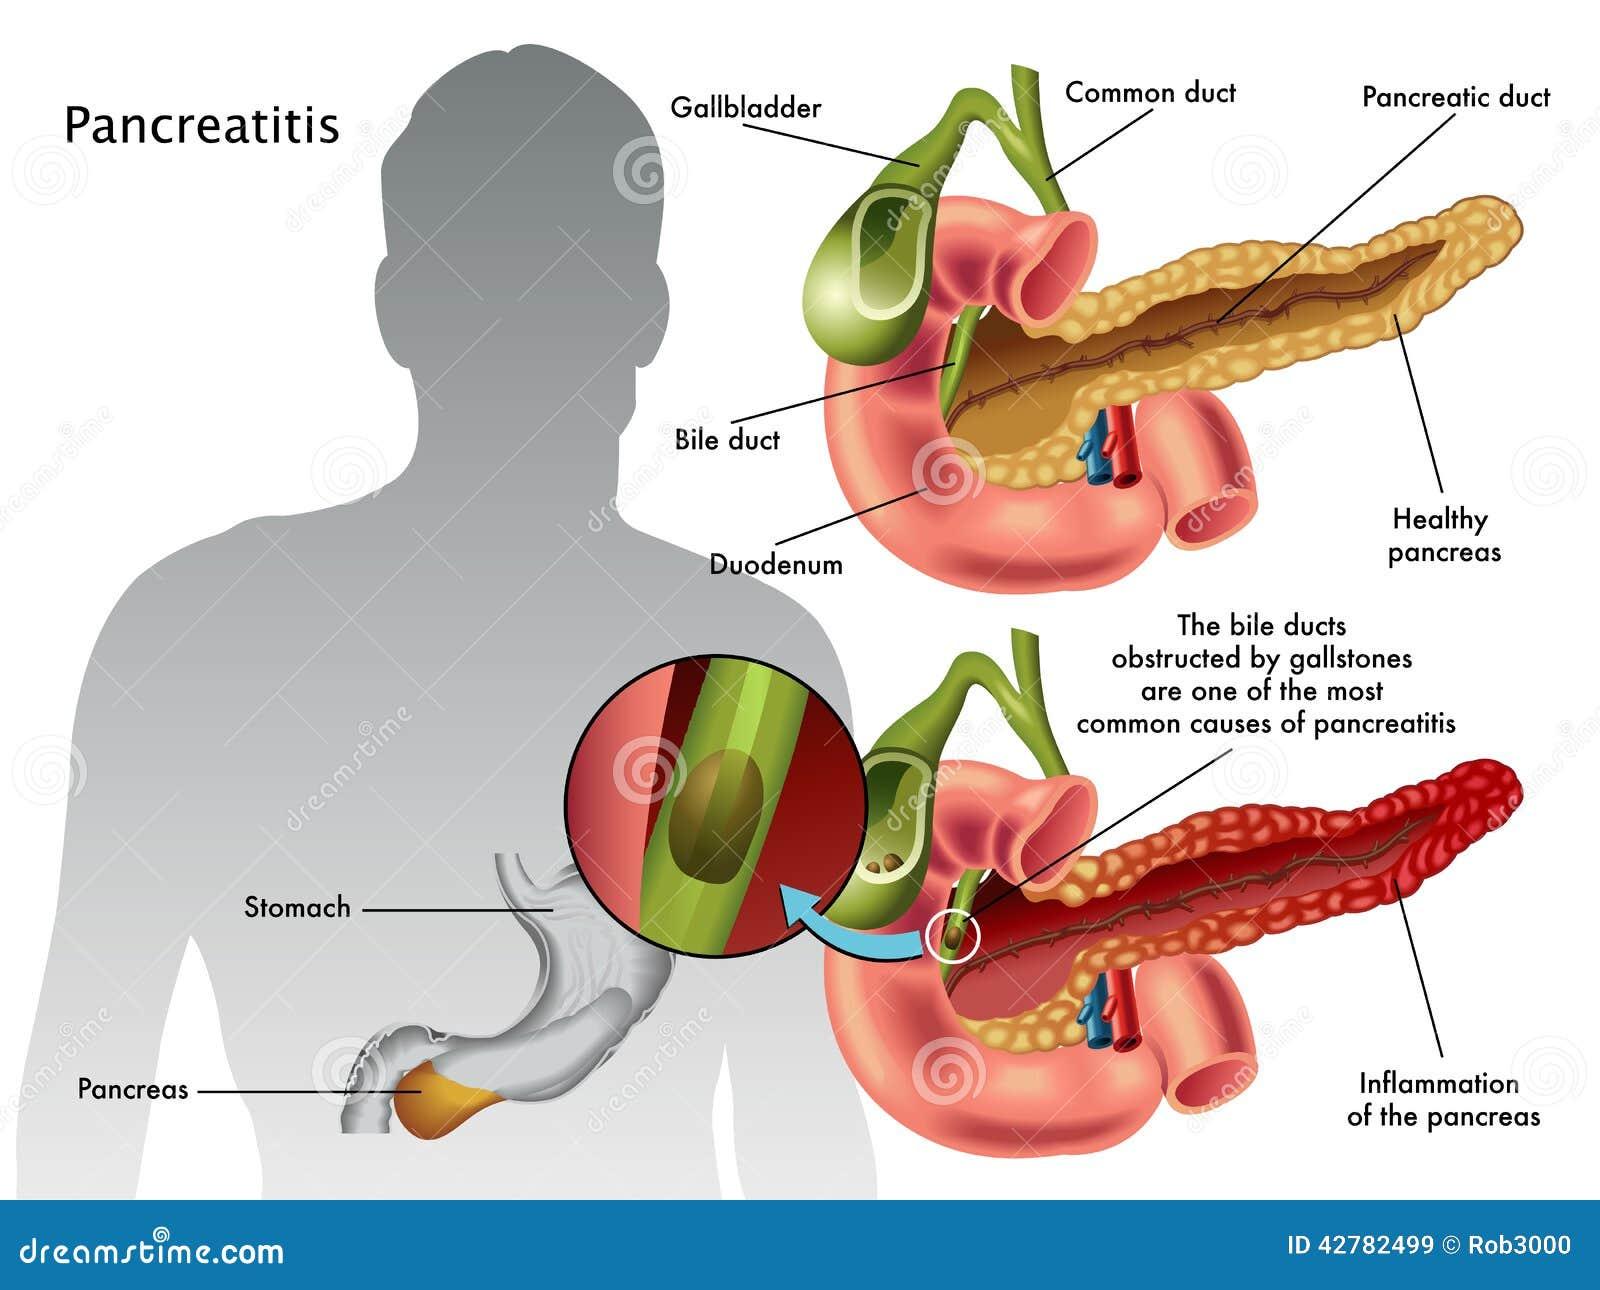 pancreatitis - photo #8